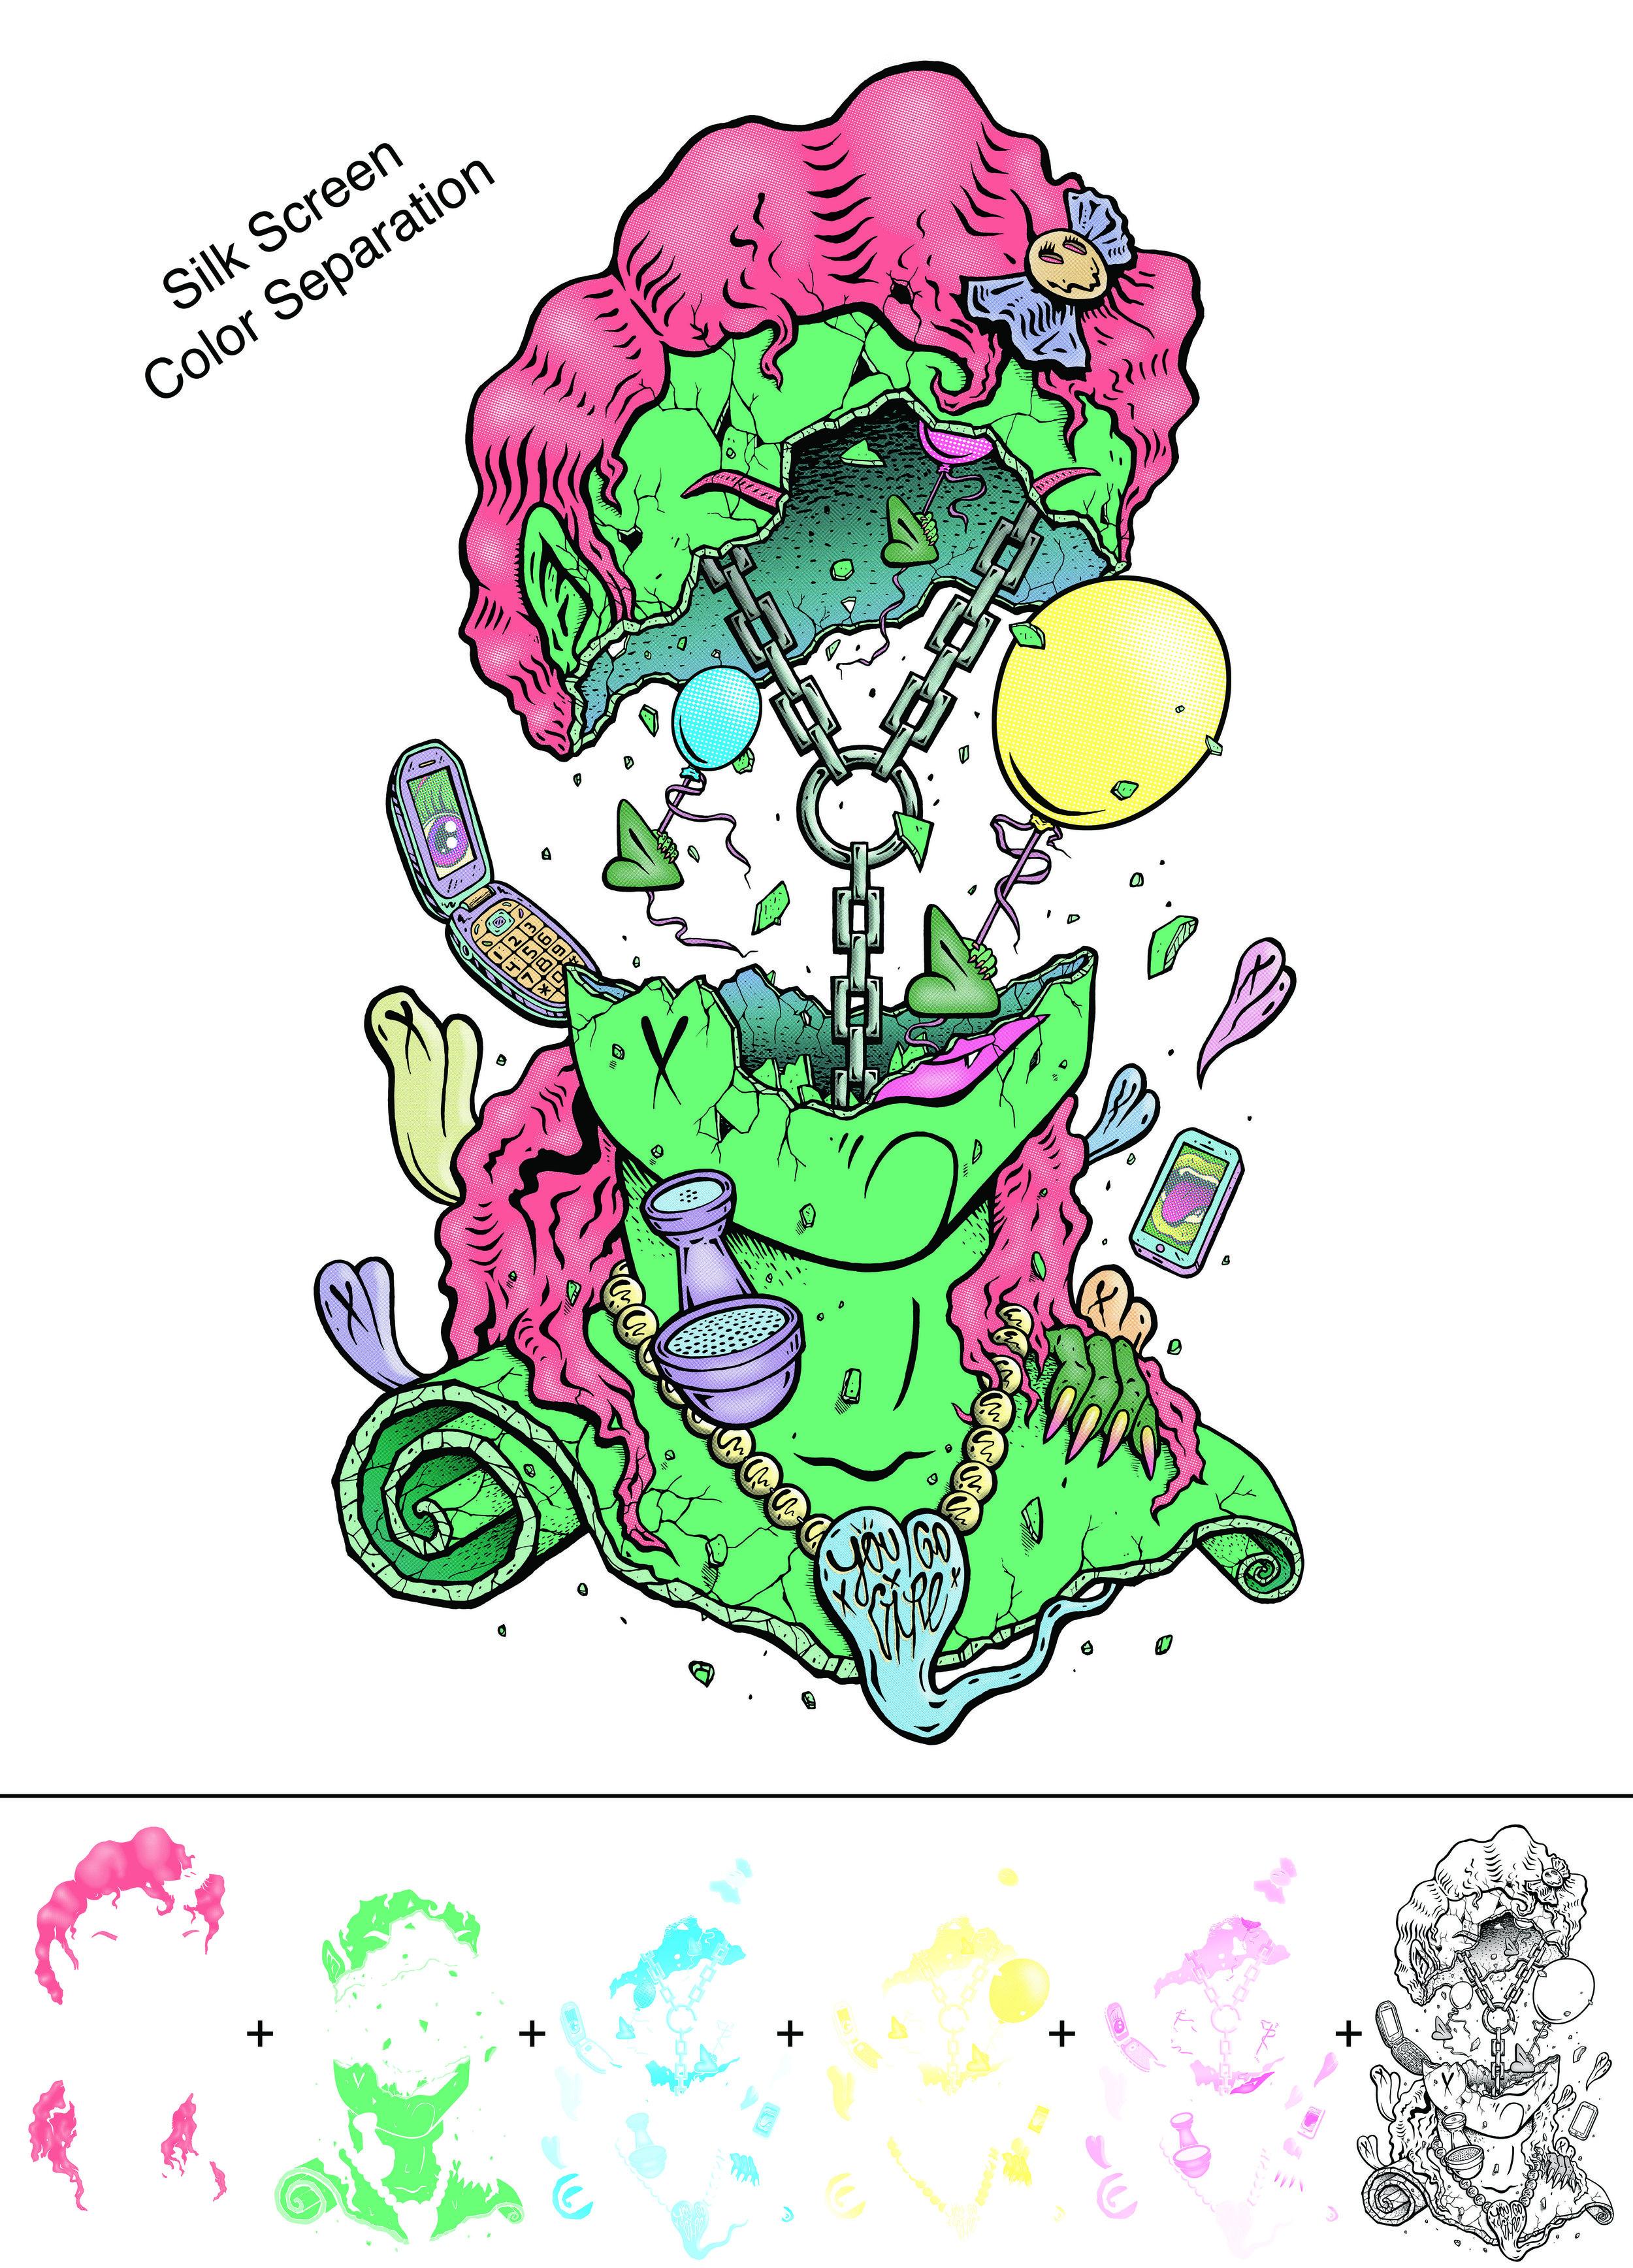 Wellisz_Color_Sep.jpg